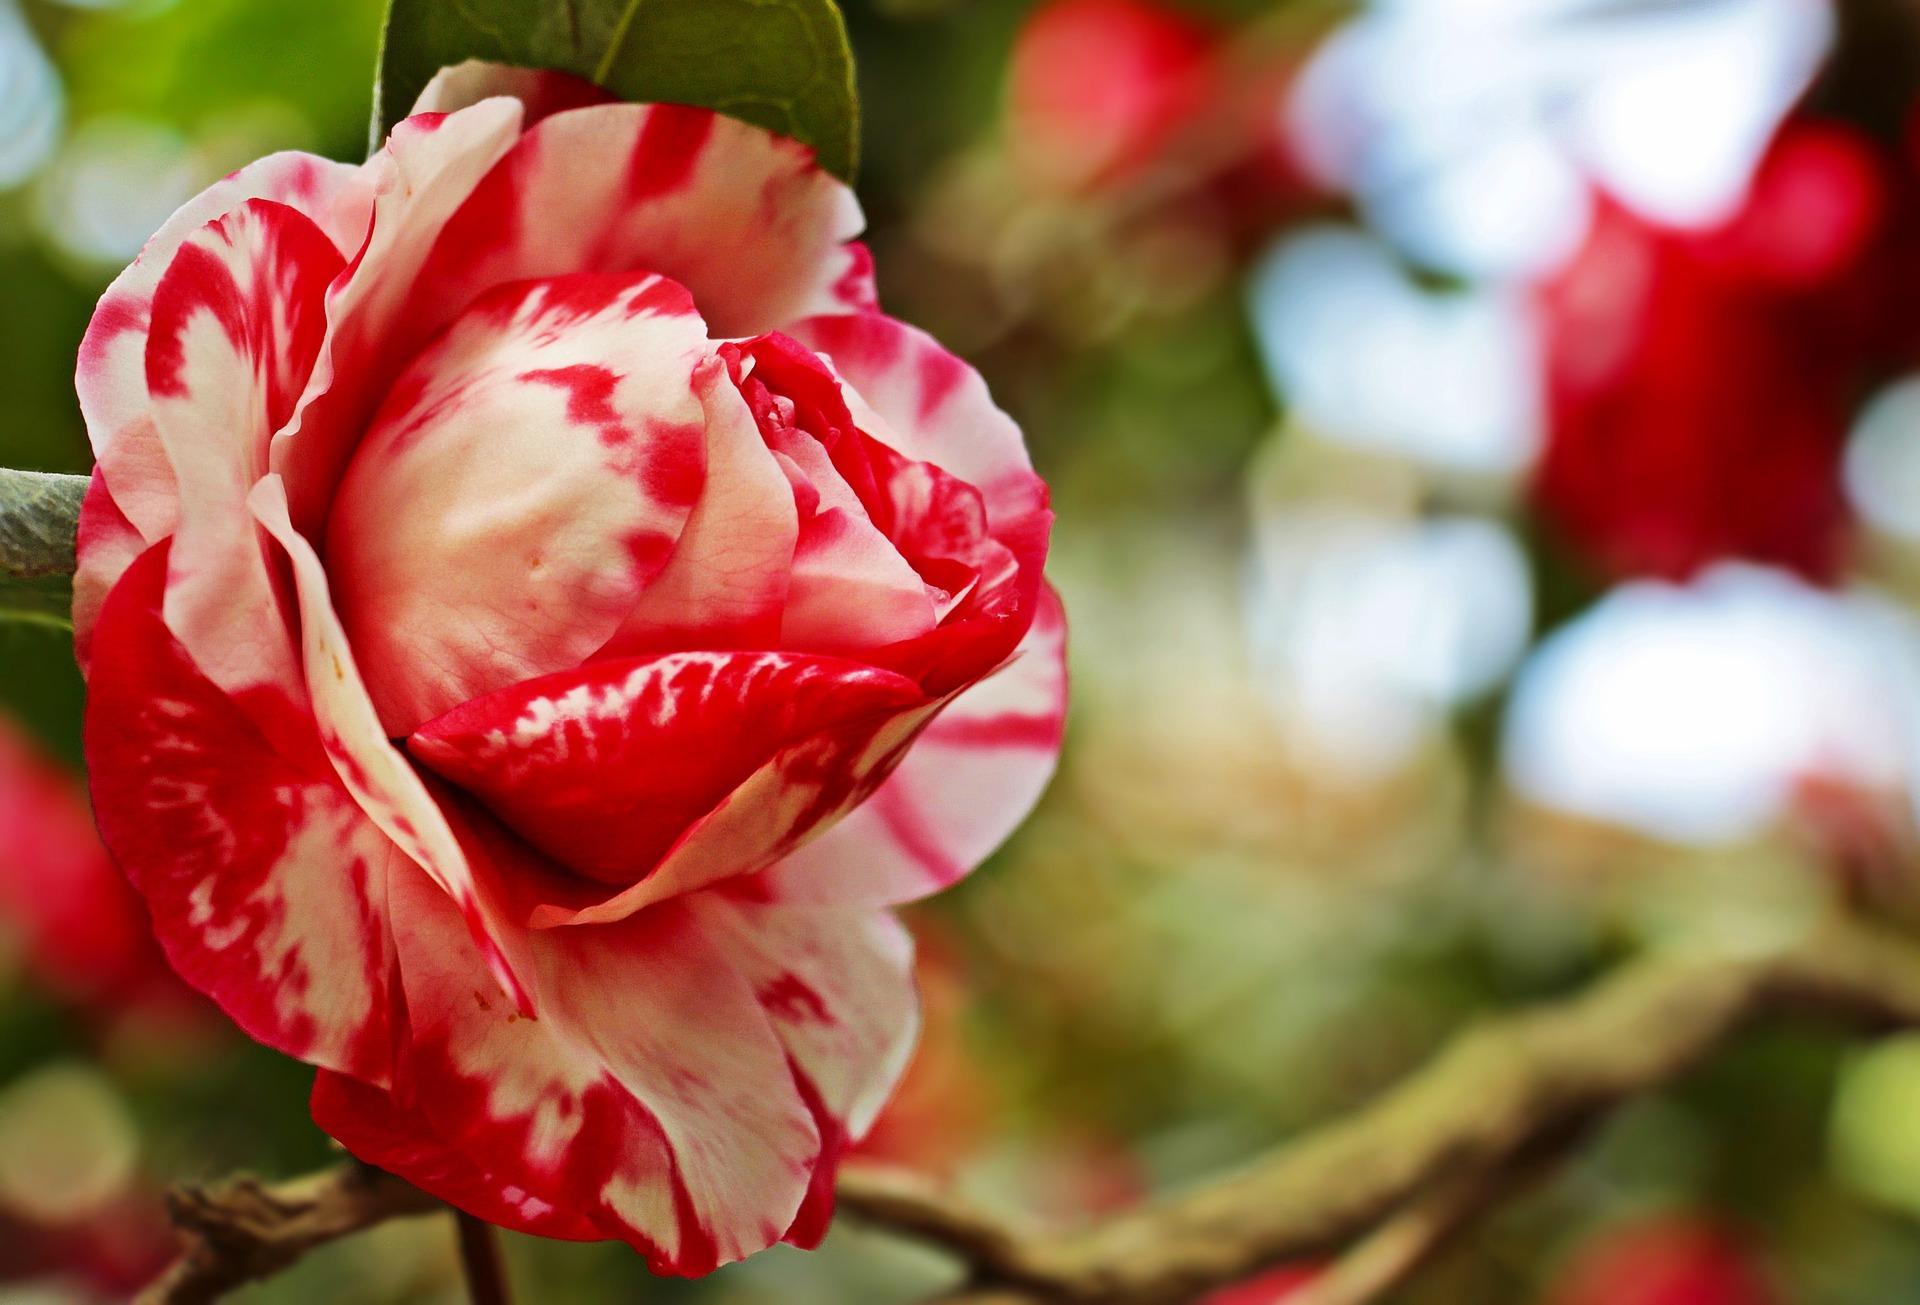 بالصور صور ورود جميلة , اجمل صور للورد 3265 3